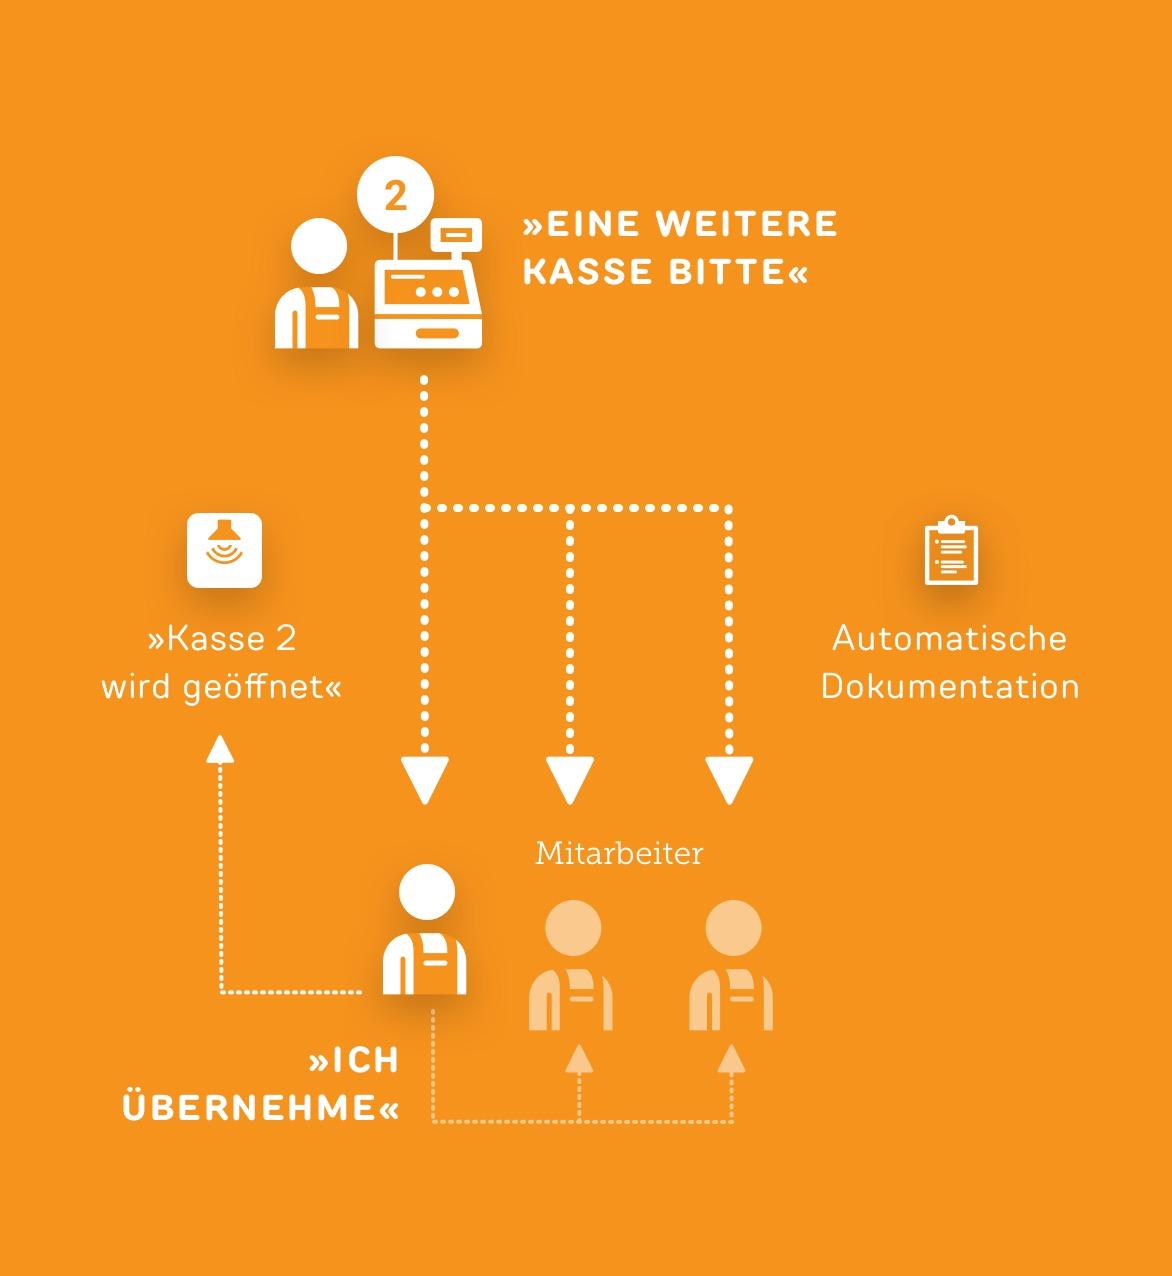 Kassenleitsystem - Use case ReAct Retail